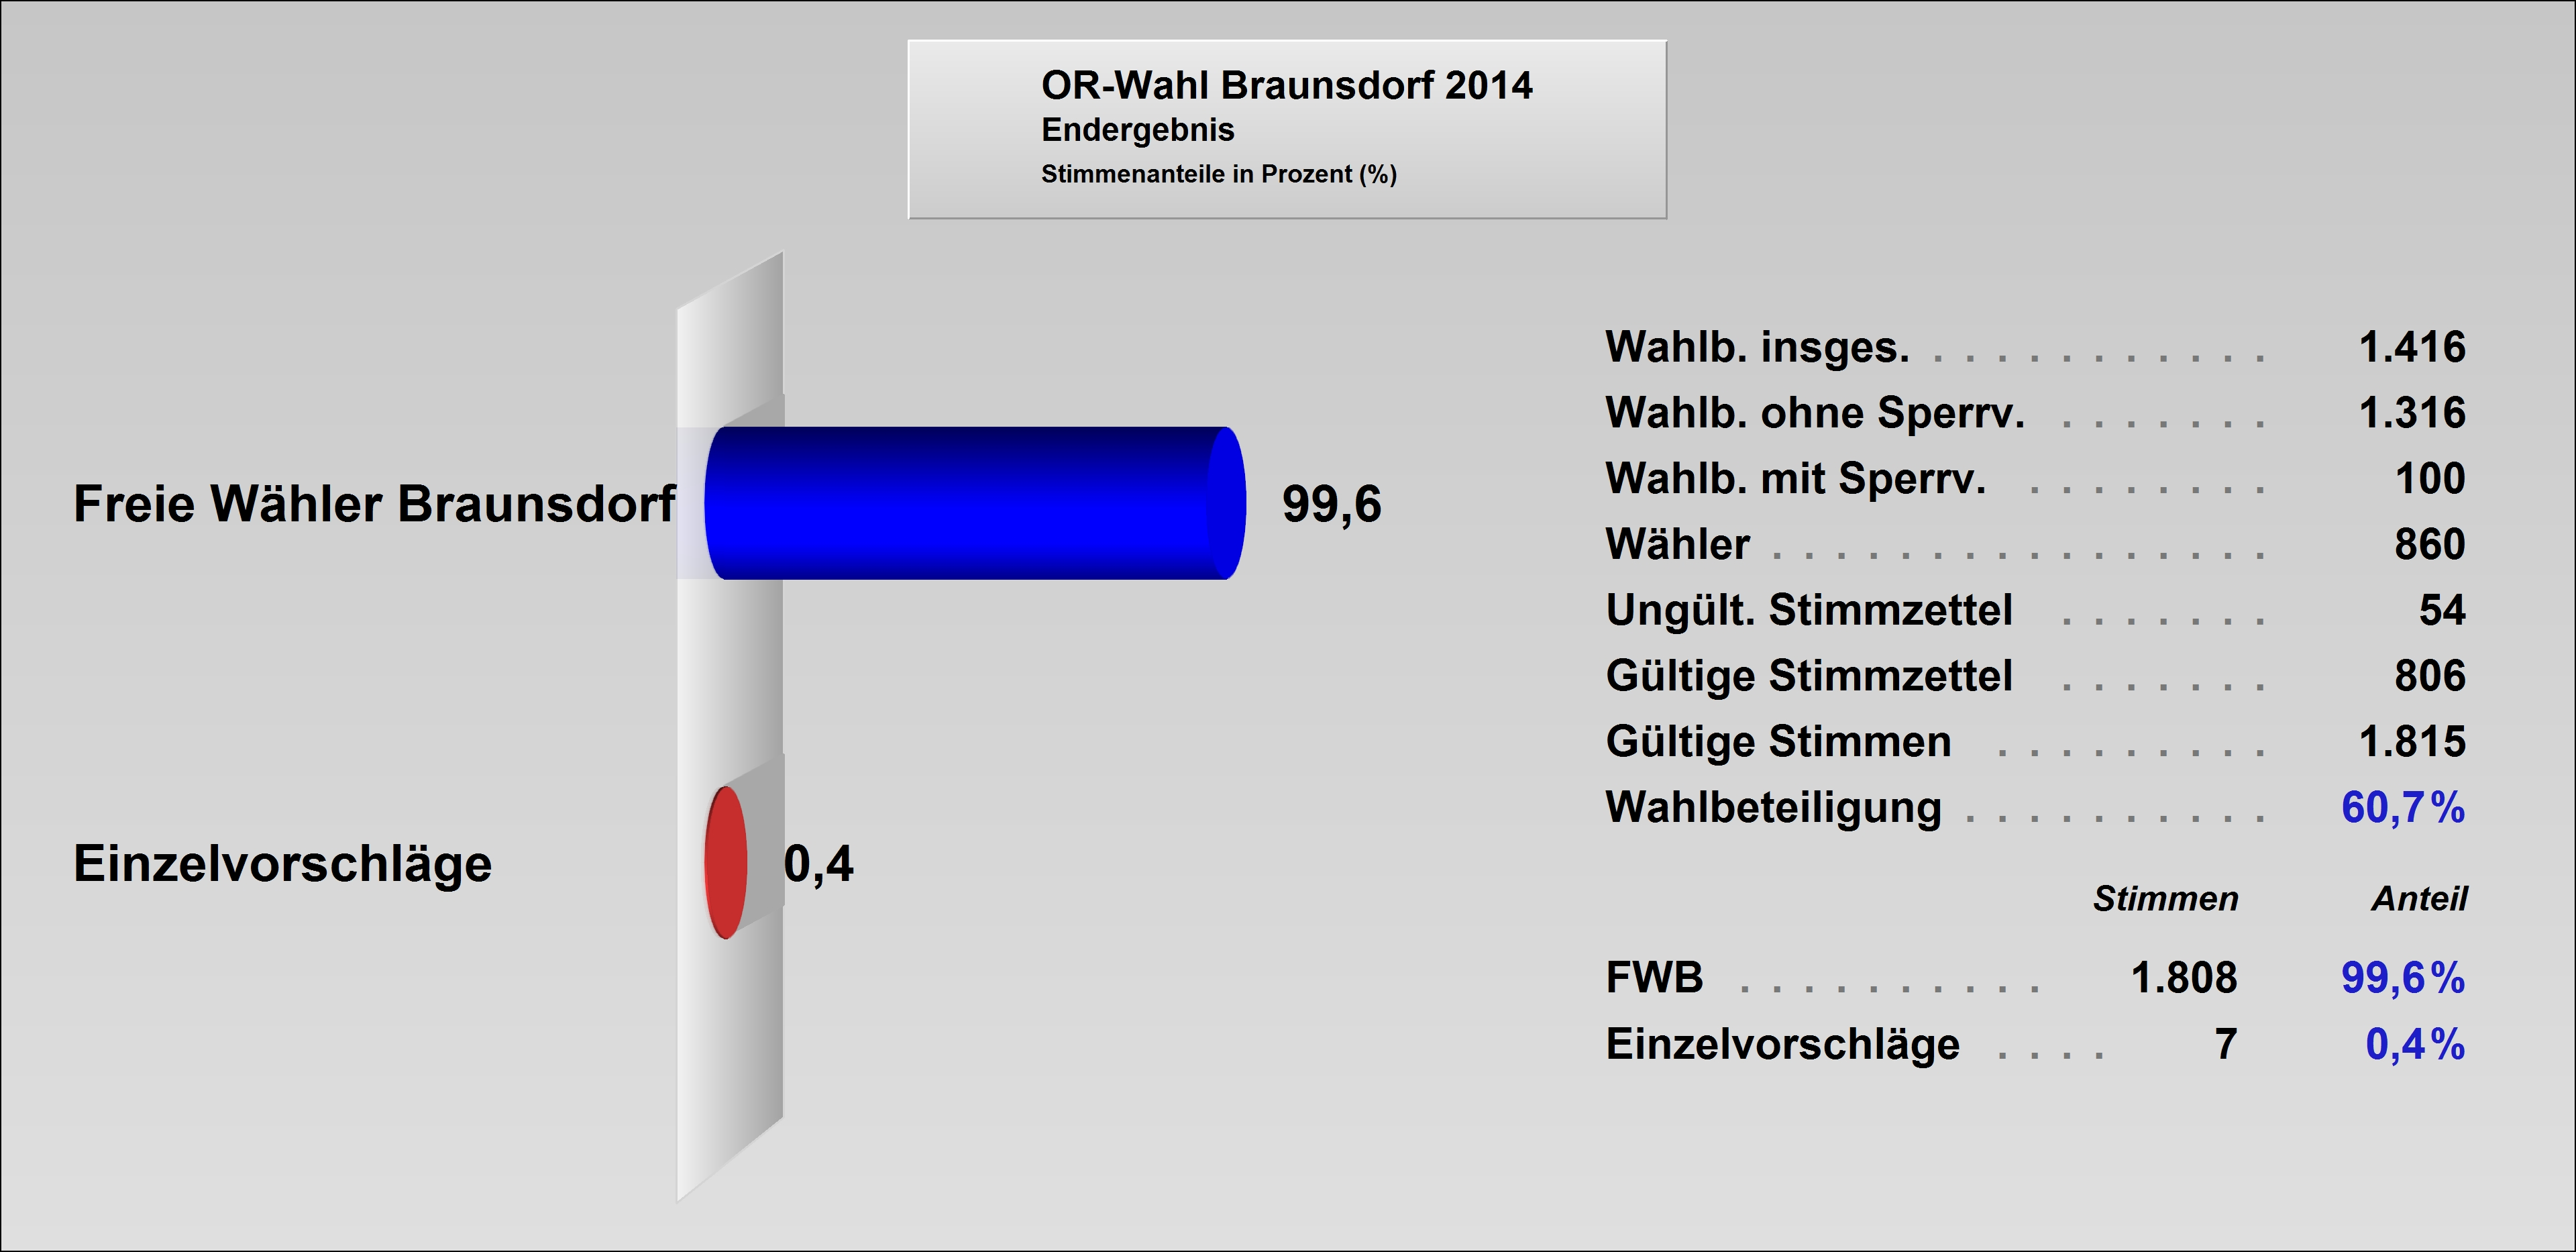 ORat2014-Braunsdorf.jpg